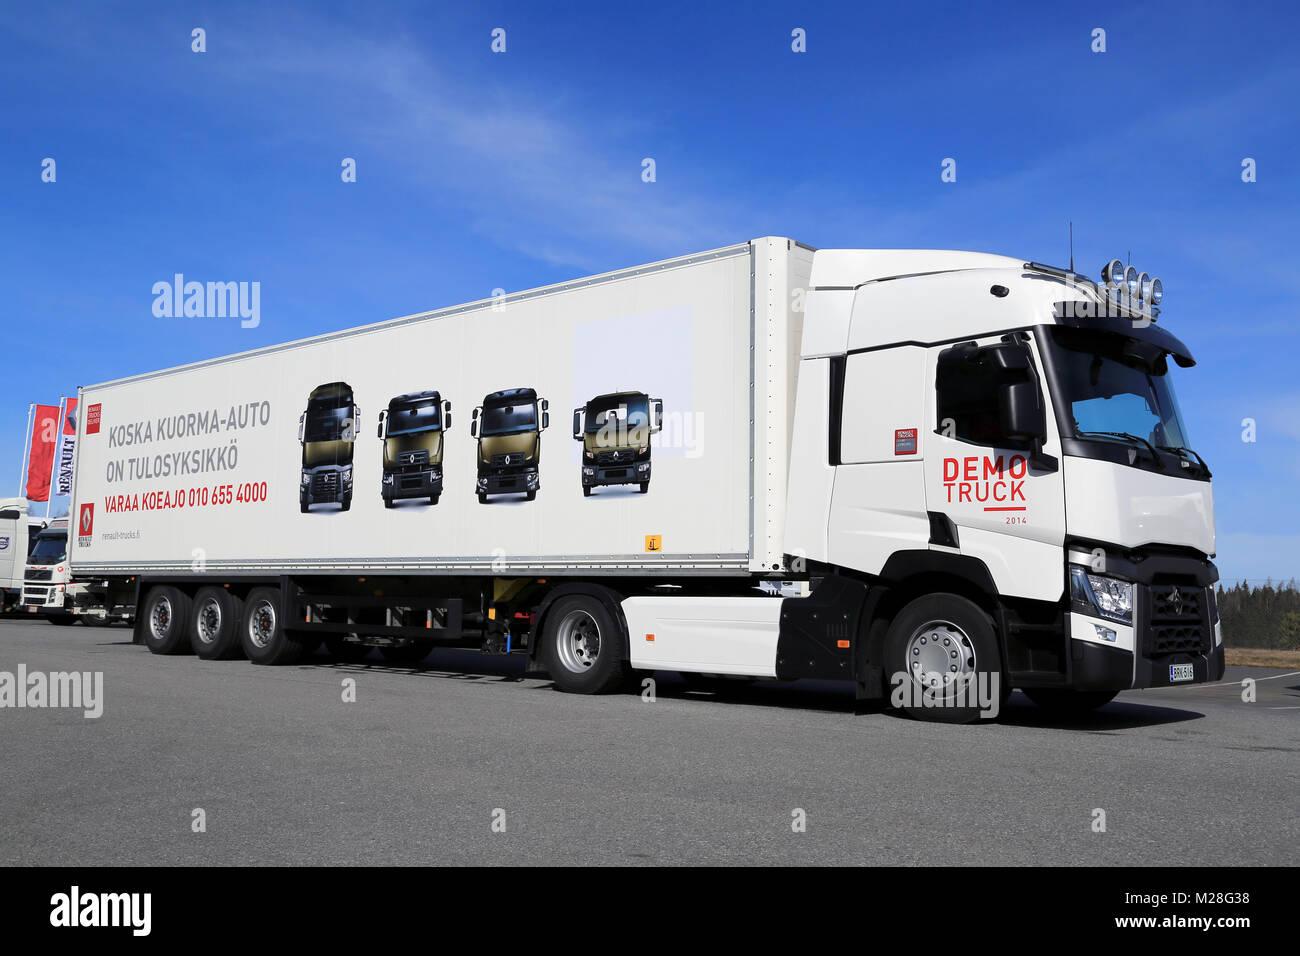 LIETO FINLAND - APRIL 5 2014: Renault Trucks presents the new Stock Photo: 173521244 - Alamy